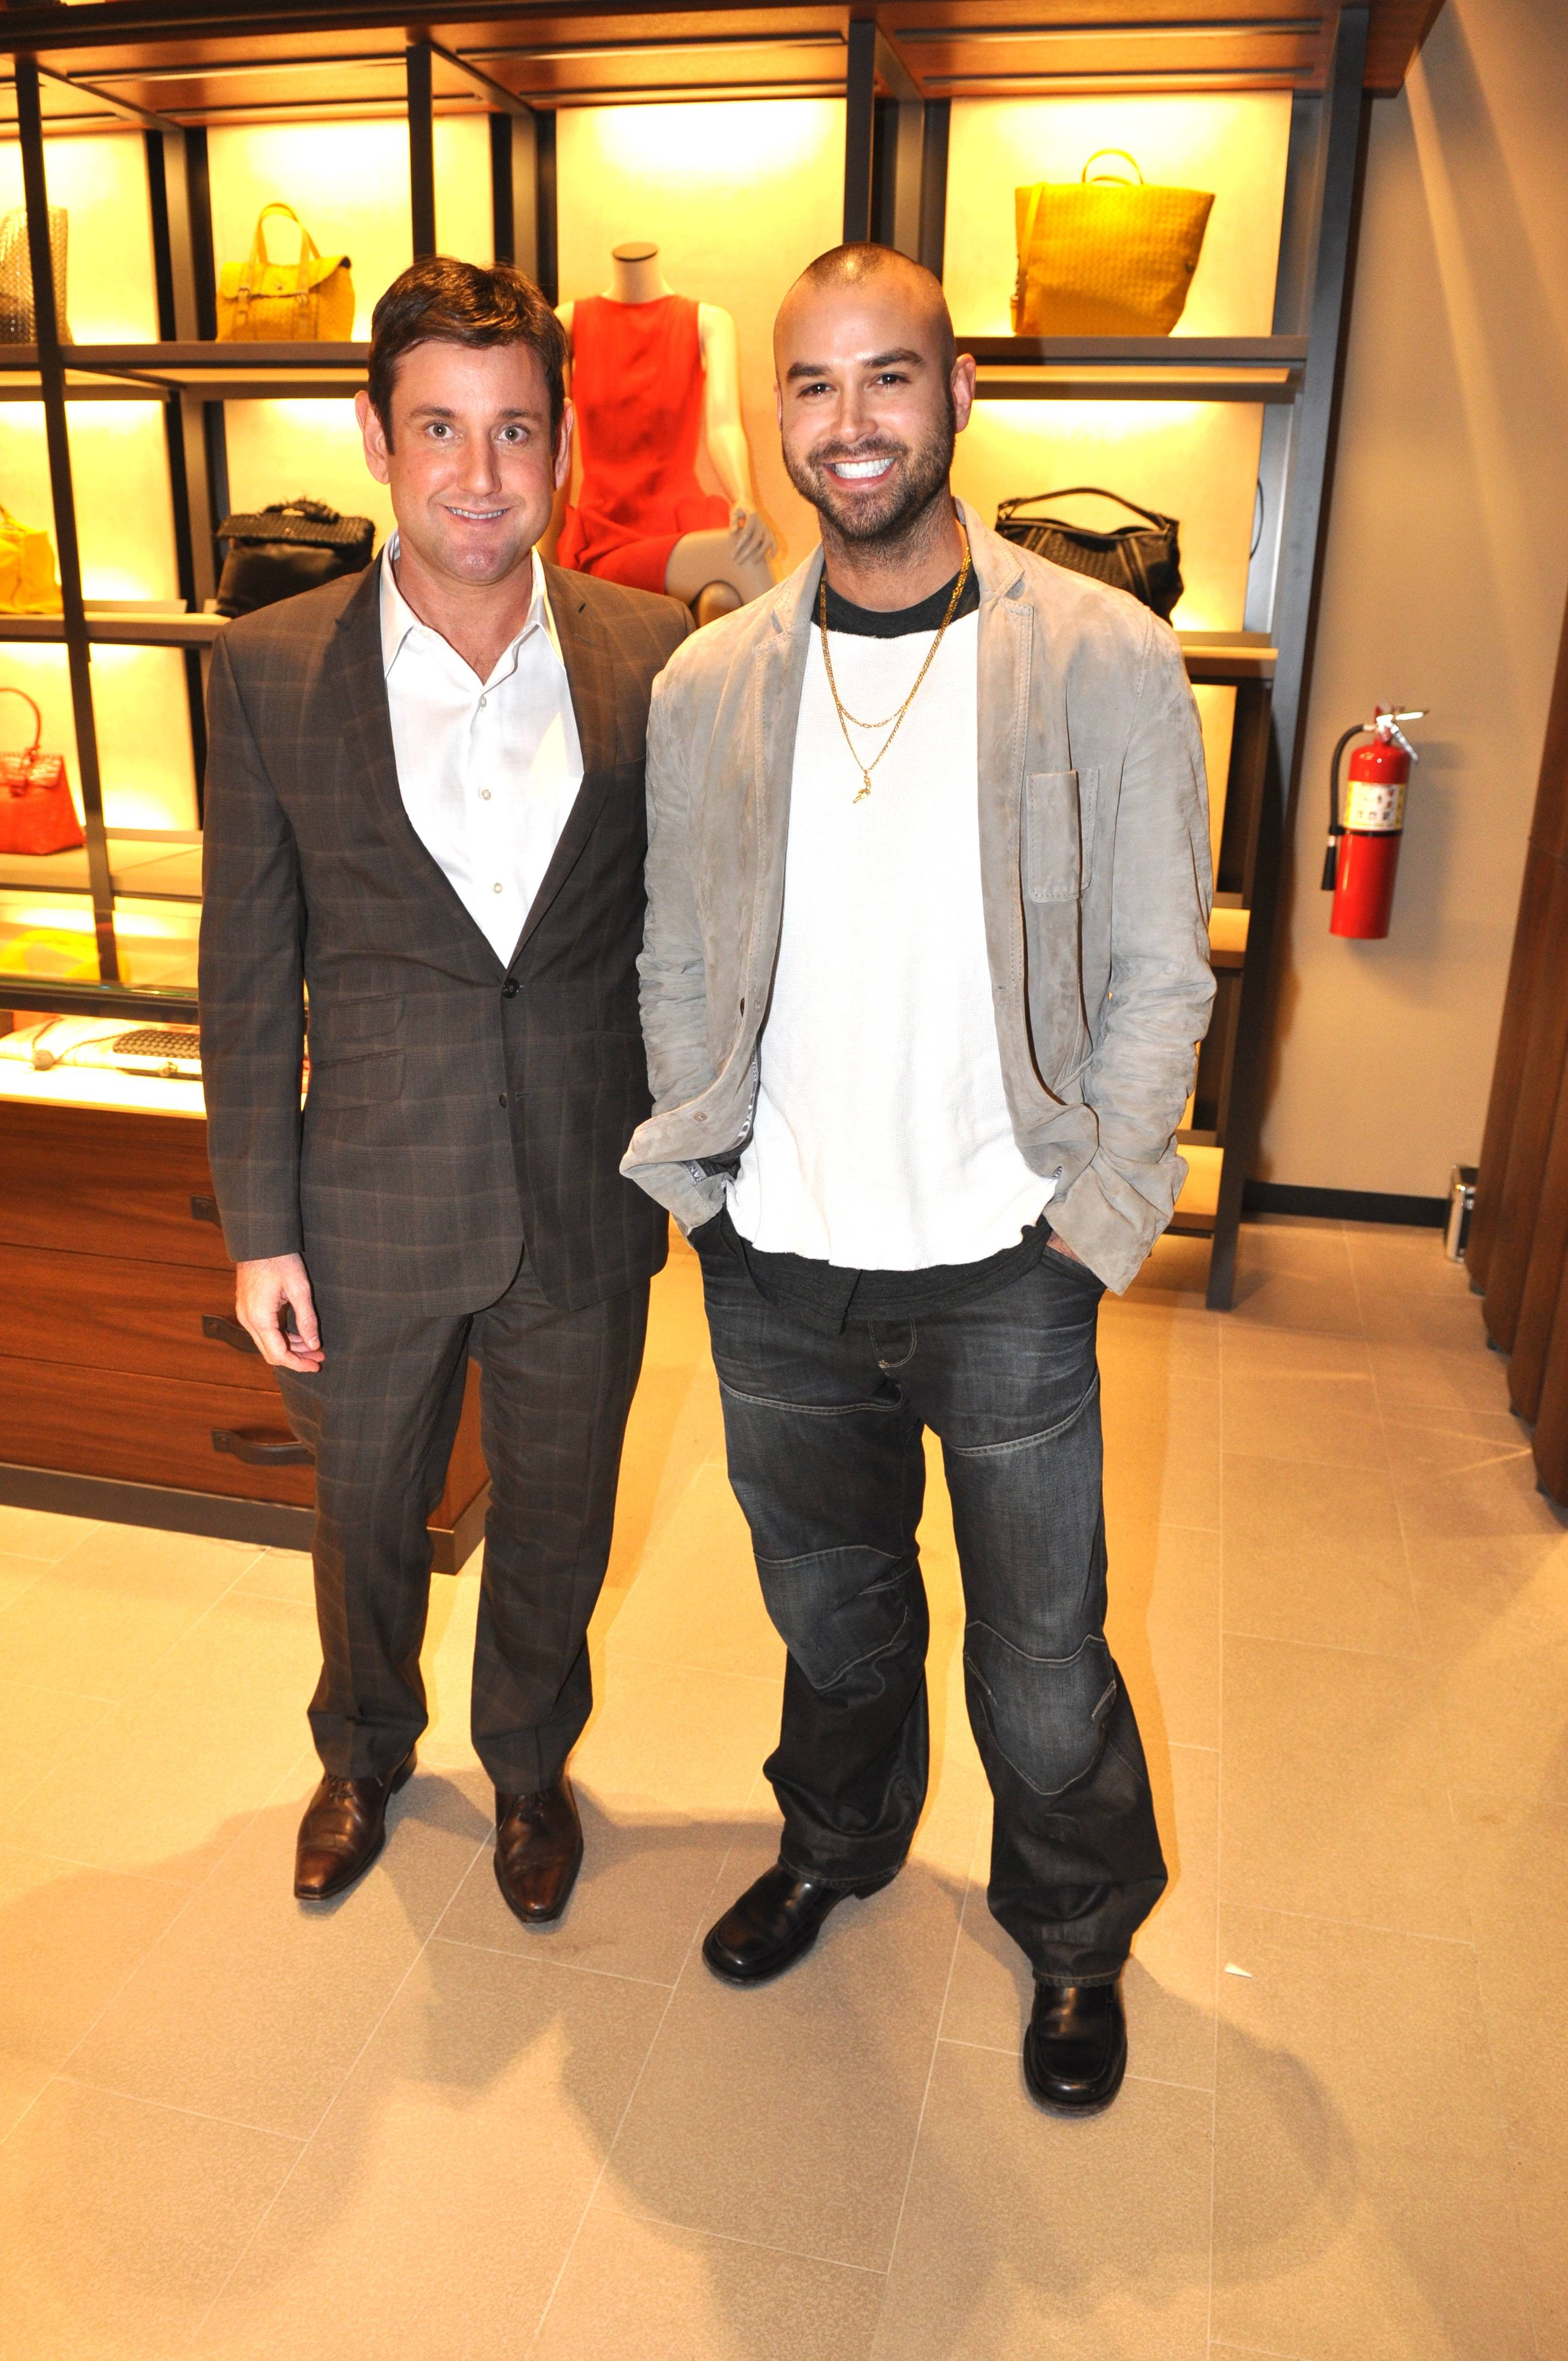 Michael Gongora & David Villalba